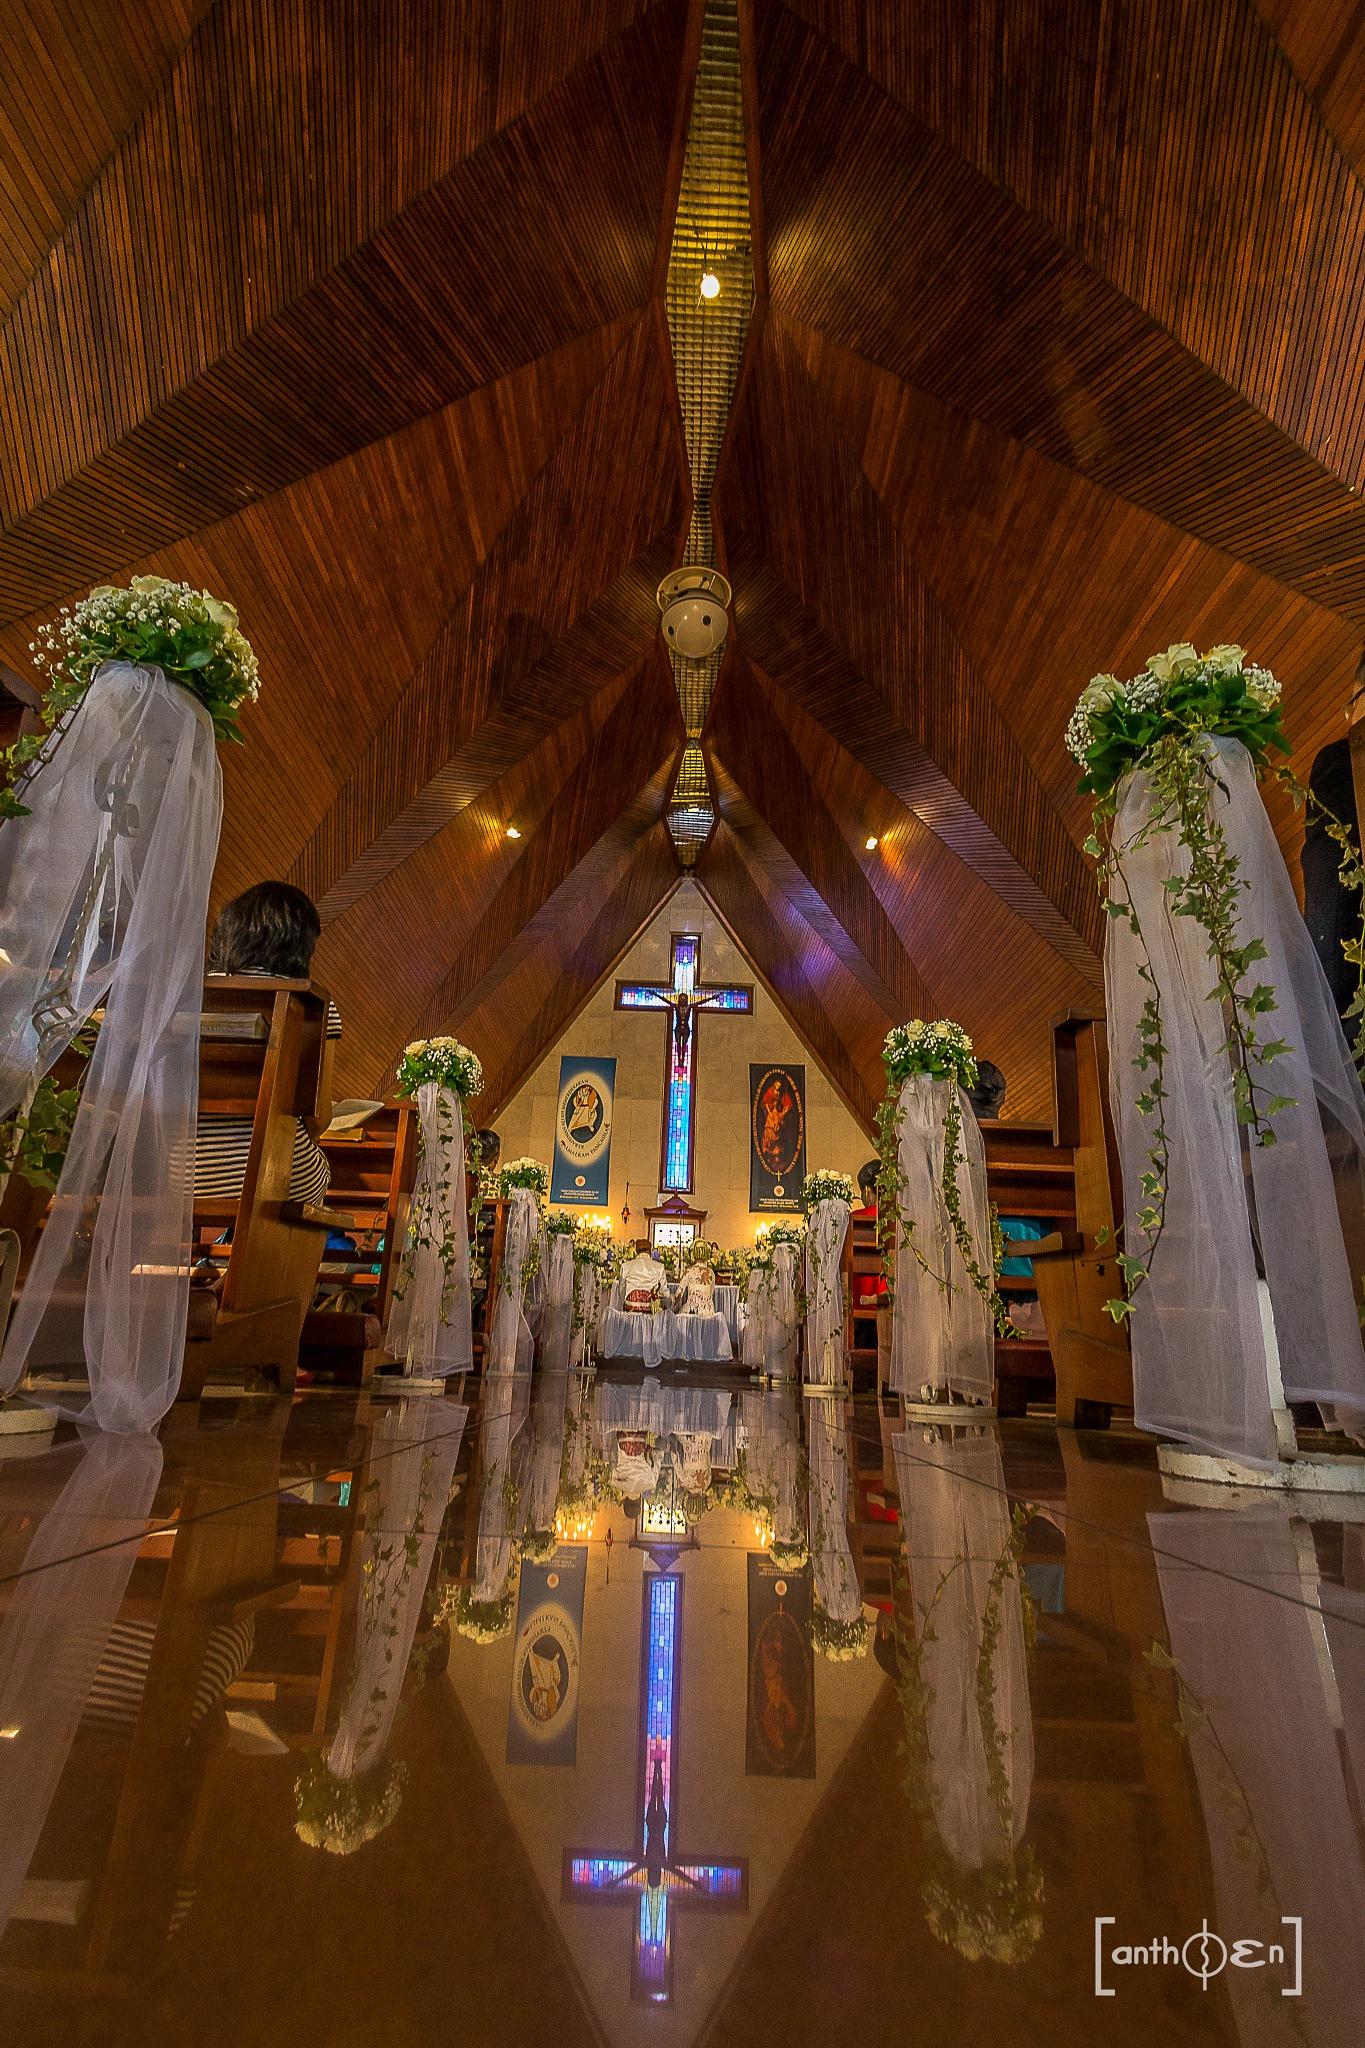 Ready sacred vow before God2 by Anthoen Luciferano Karnanta